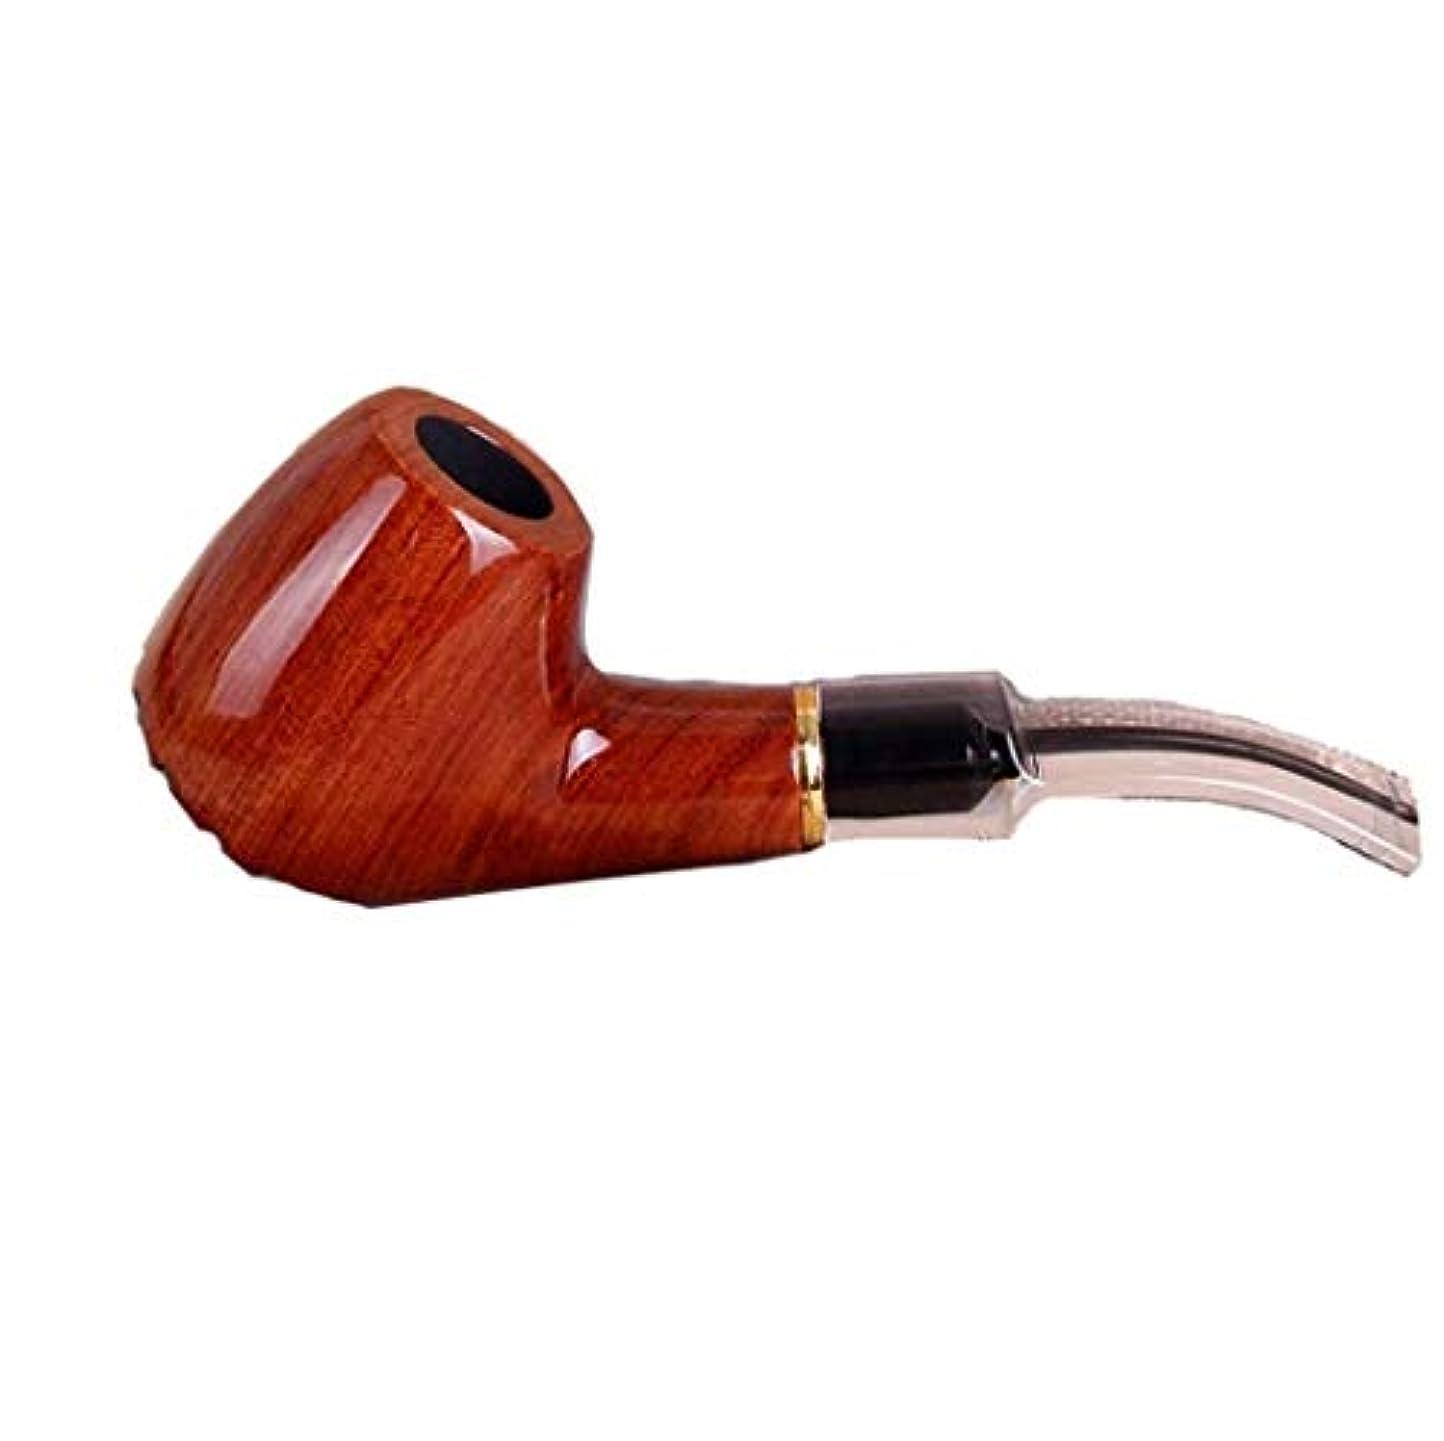 TYUIO 喫煙パイプ - 手作りタバコパイプ、喫煙パイプ木製パイプラックパイプホルダー